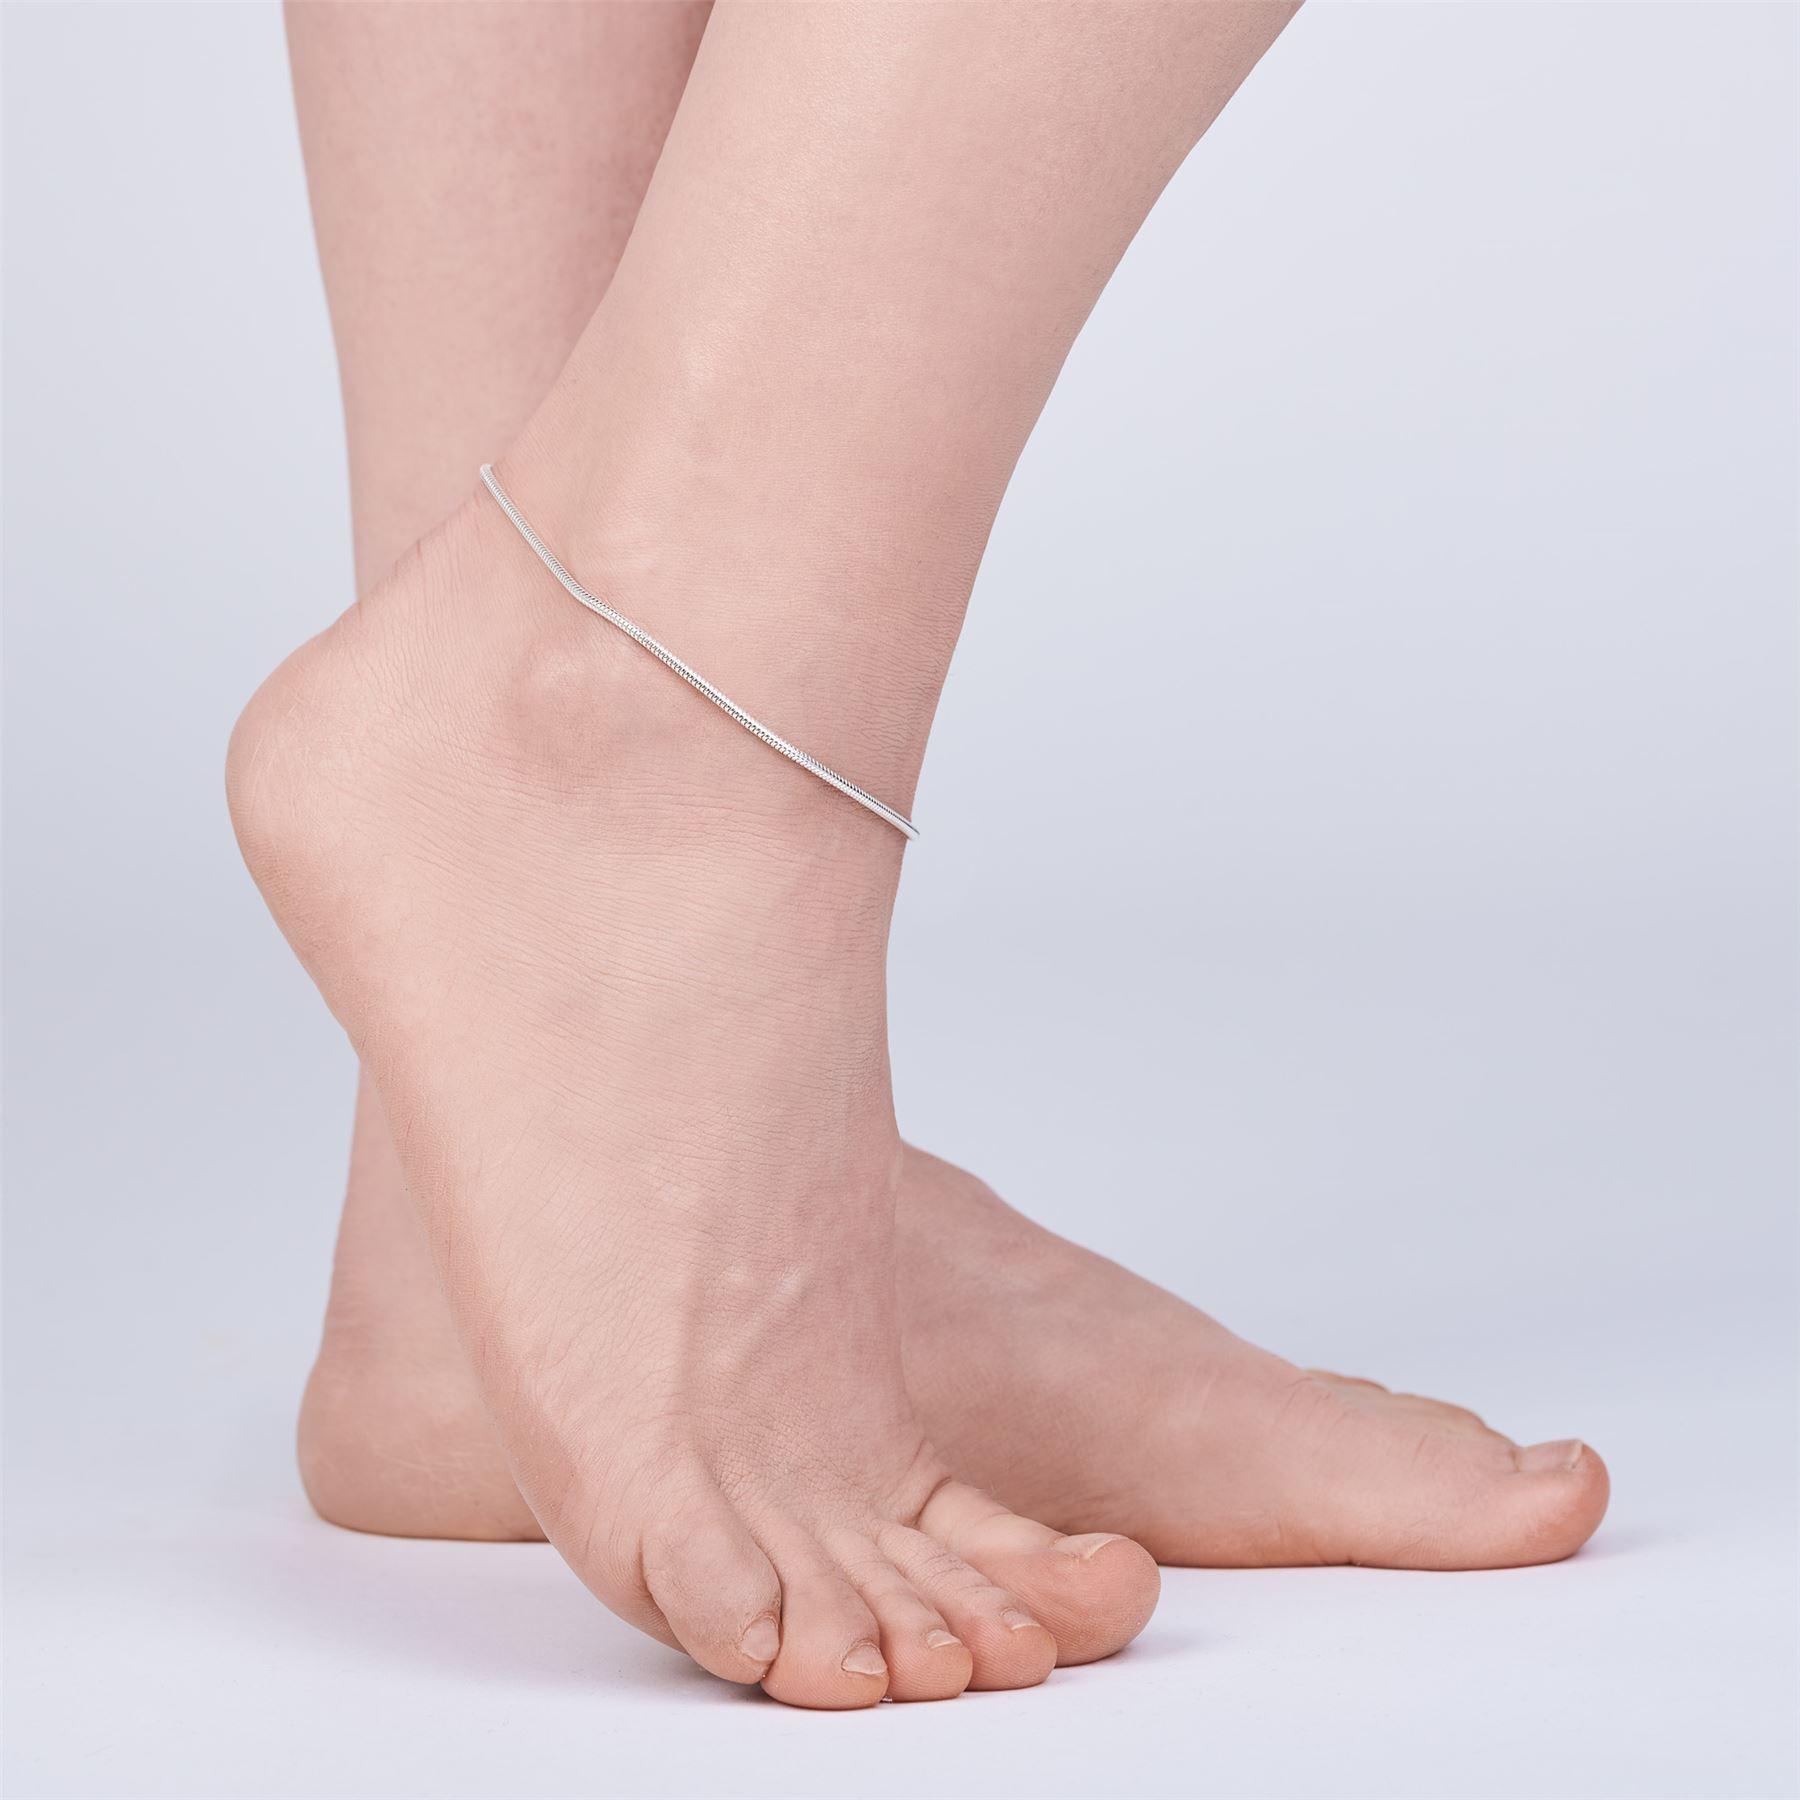 Amberta-Jewelry-925-Sterling-Silver-Adjustable-Anklet-Foot-Bracelet-for-Women miniature 30